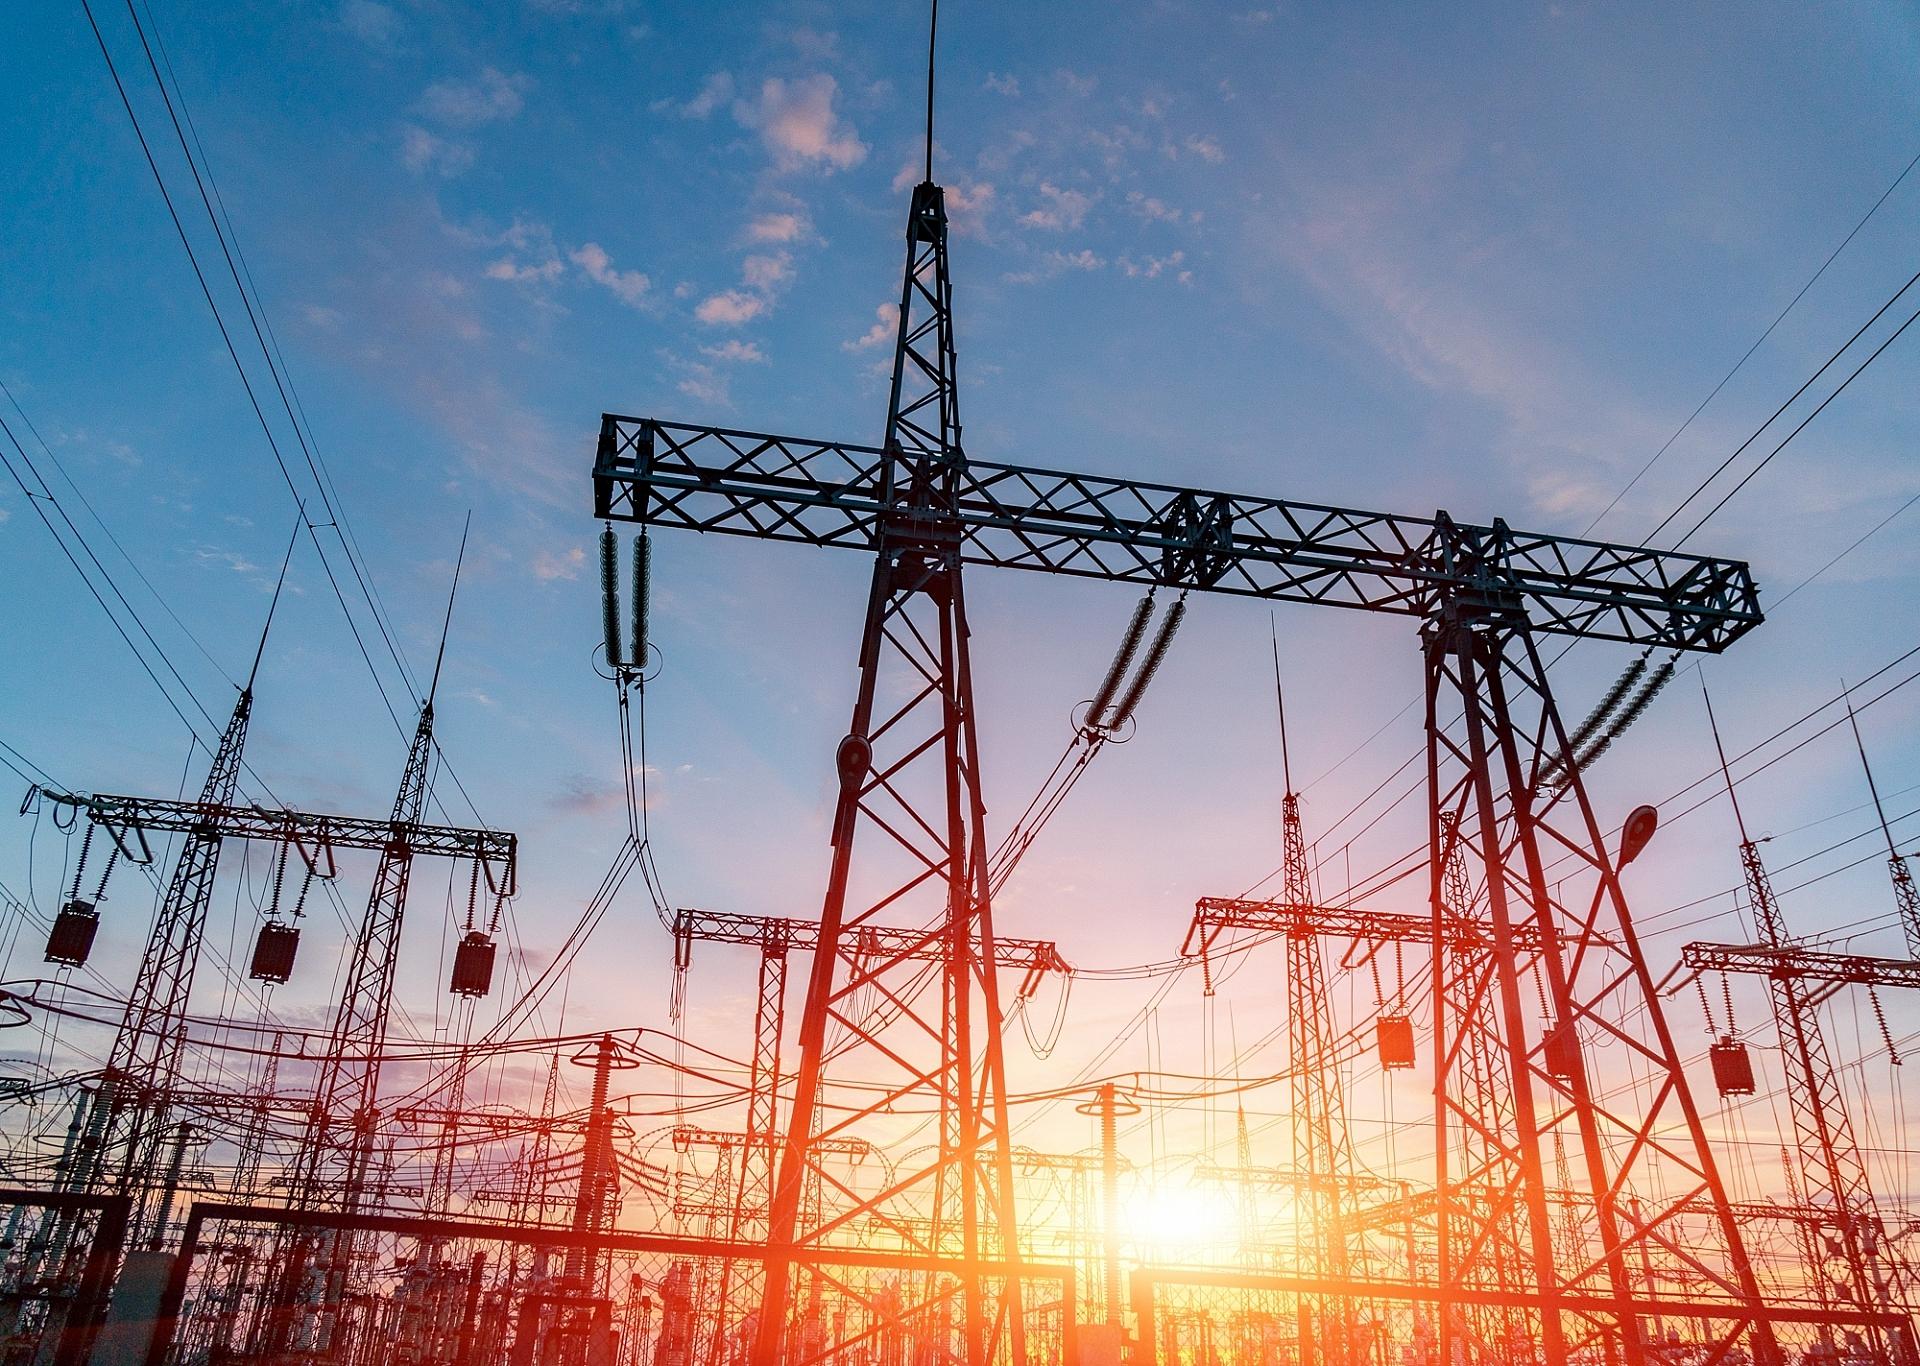 Energy elektriciteitsmast schubergphilis 19